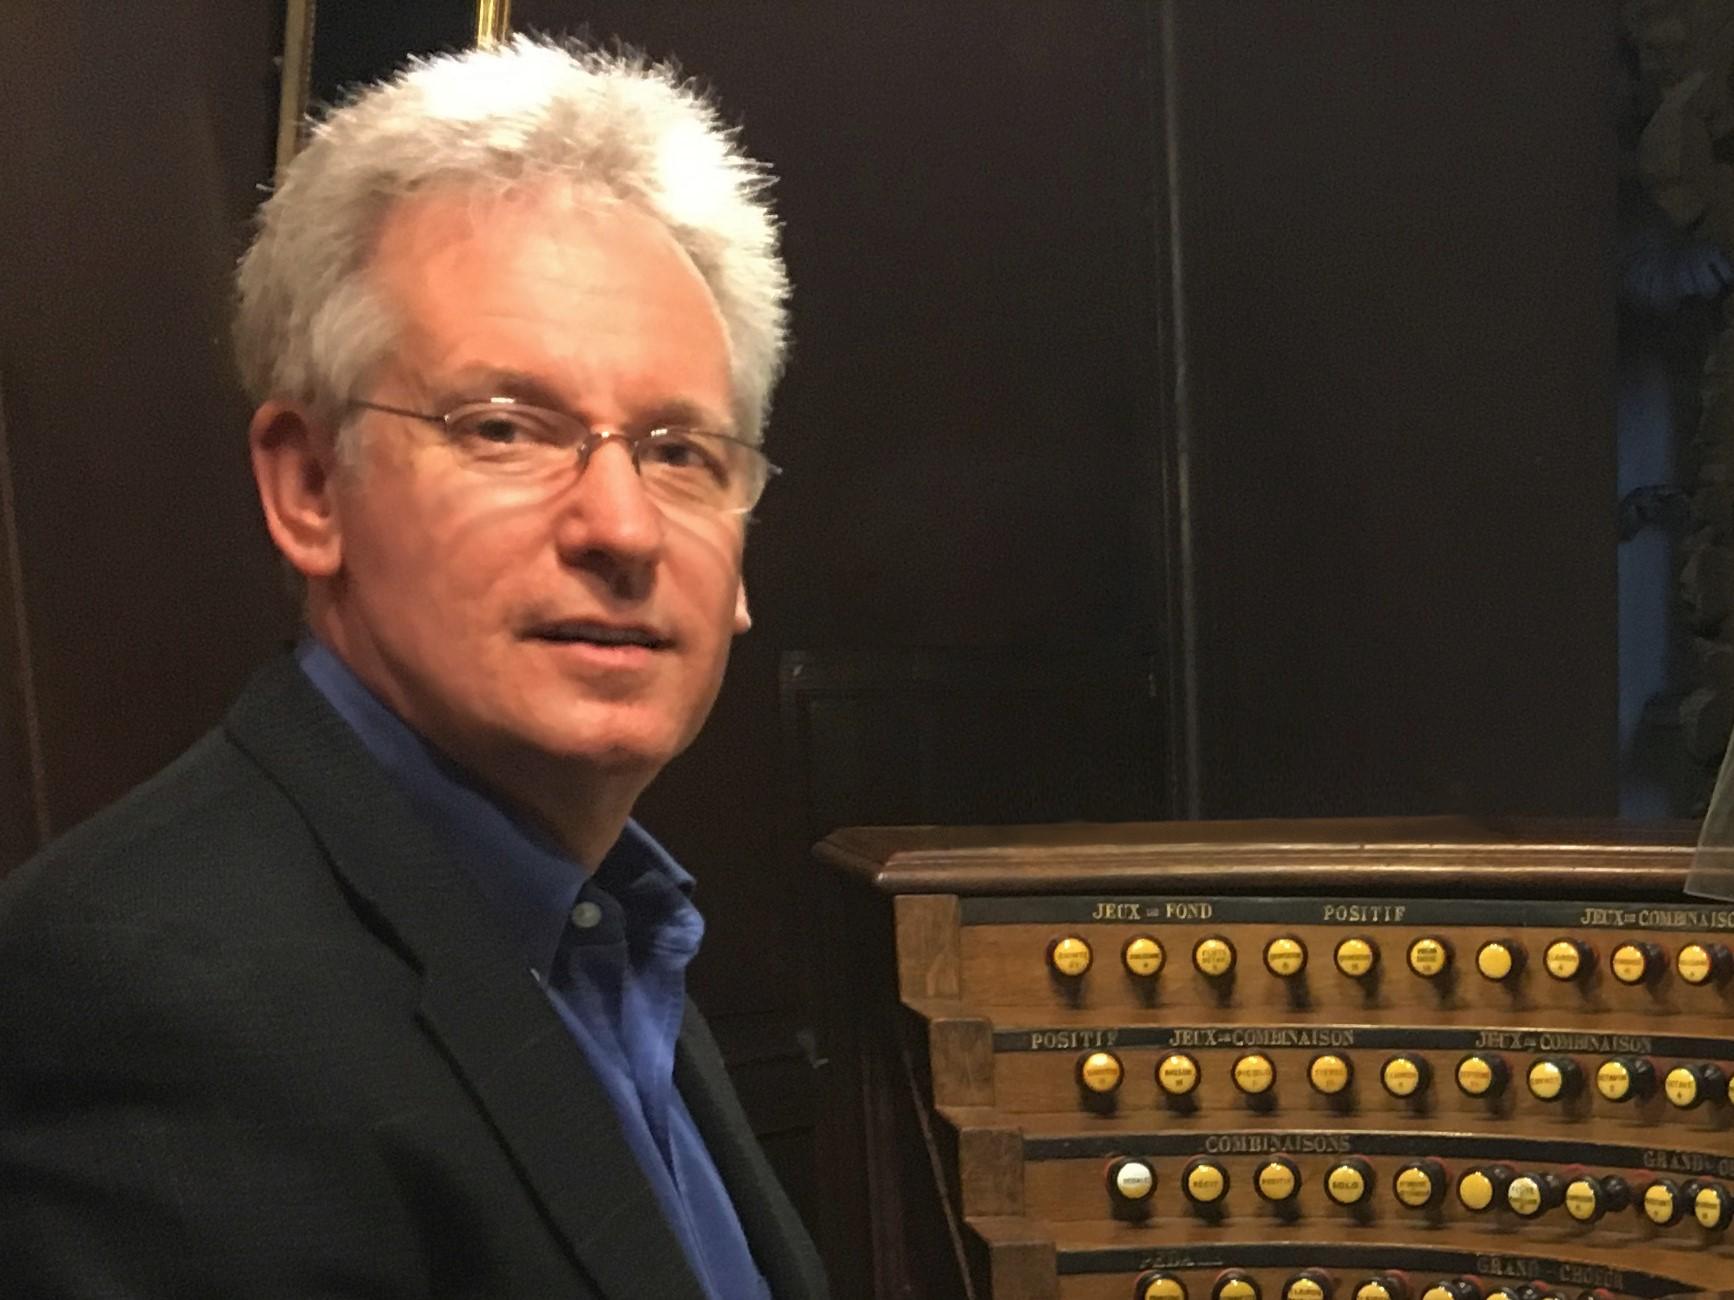 Organ Recital featuring Kenneth Danchik